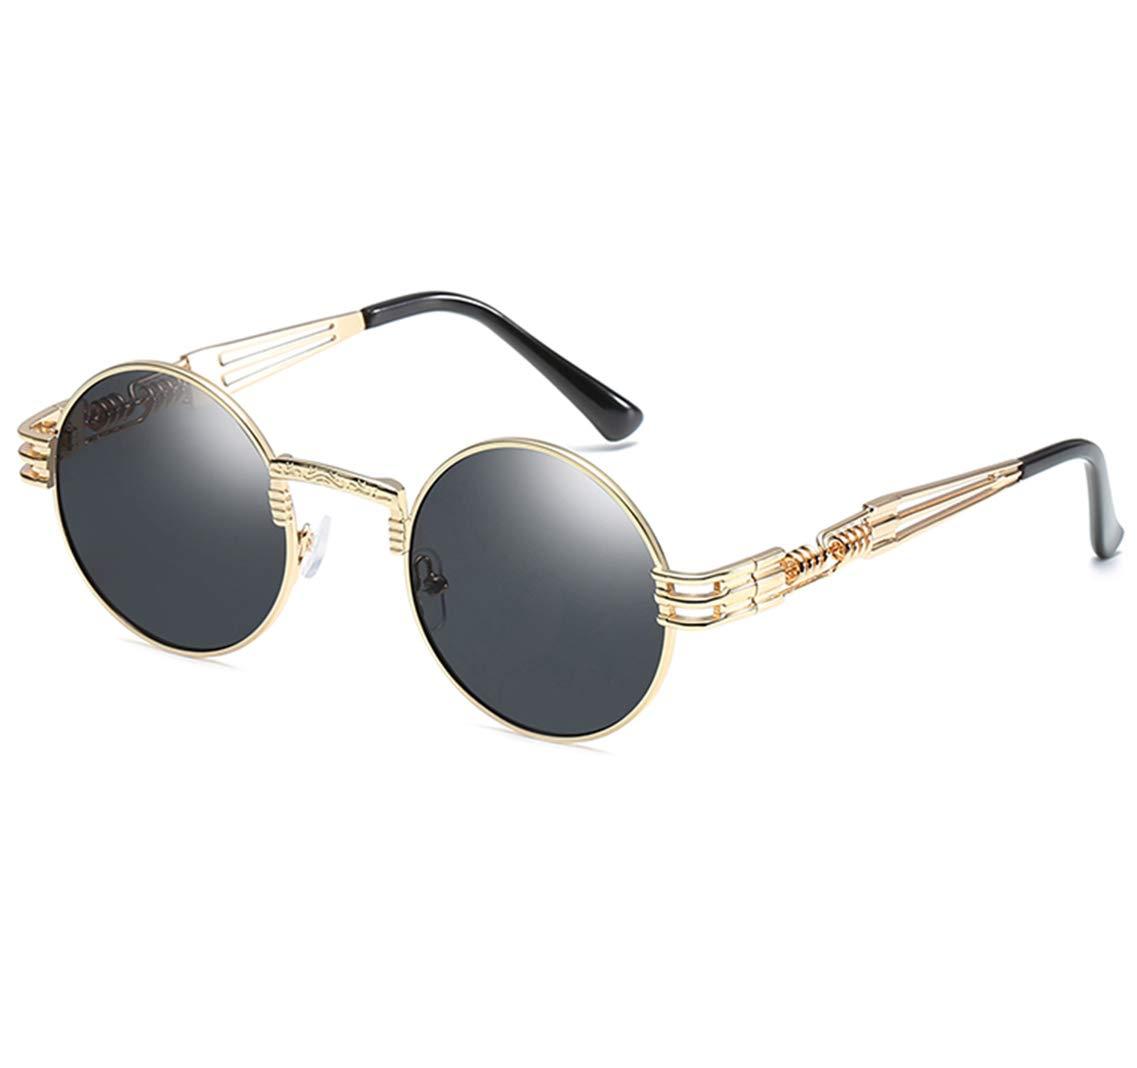 GAMT John Lennon Glasses Quavo Steampunk Round Sunglasses Circle Metal Frame Eyewear for Men and Women (Gray ...) by GAMT